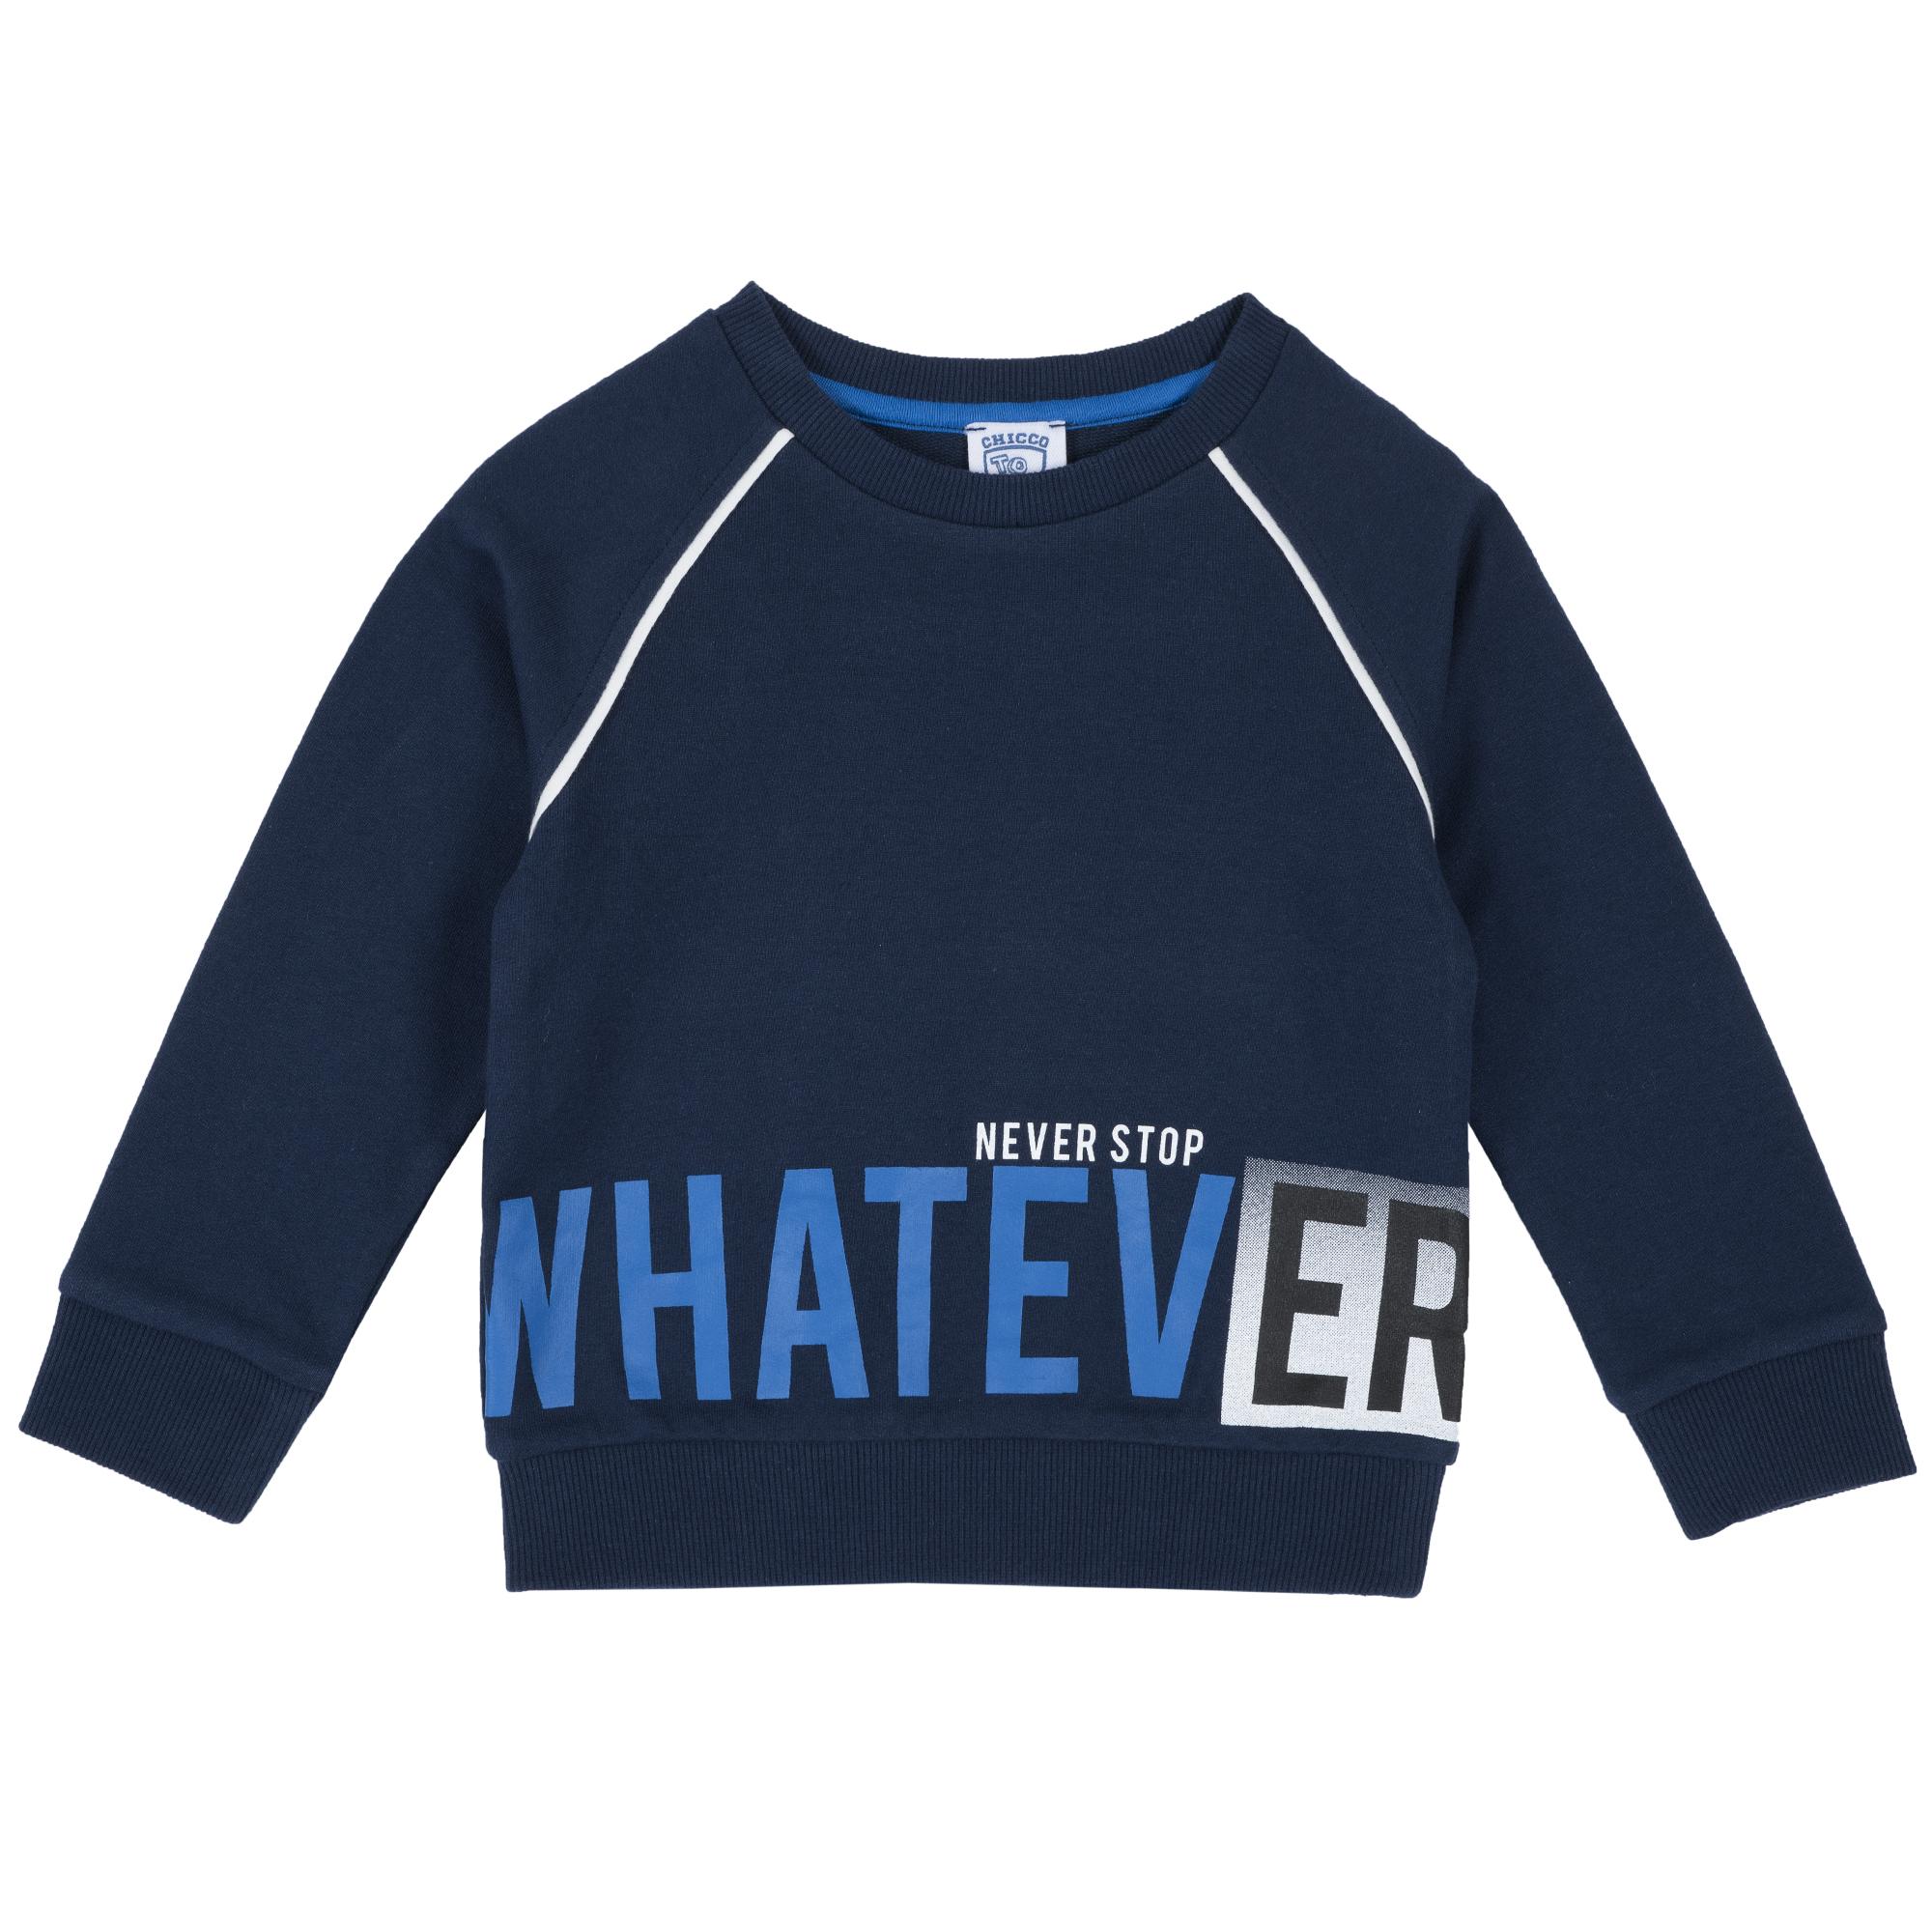 Bluza copii Chicco, sport, albastru inchis, 69364